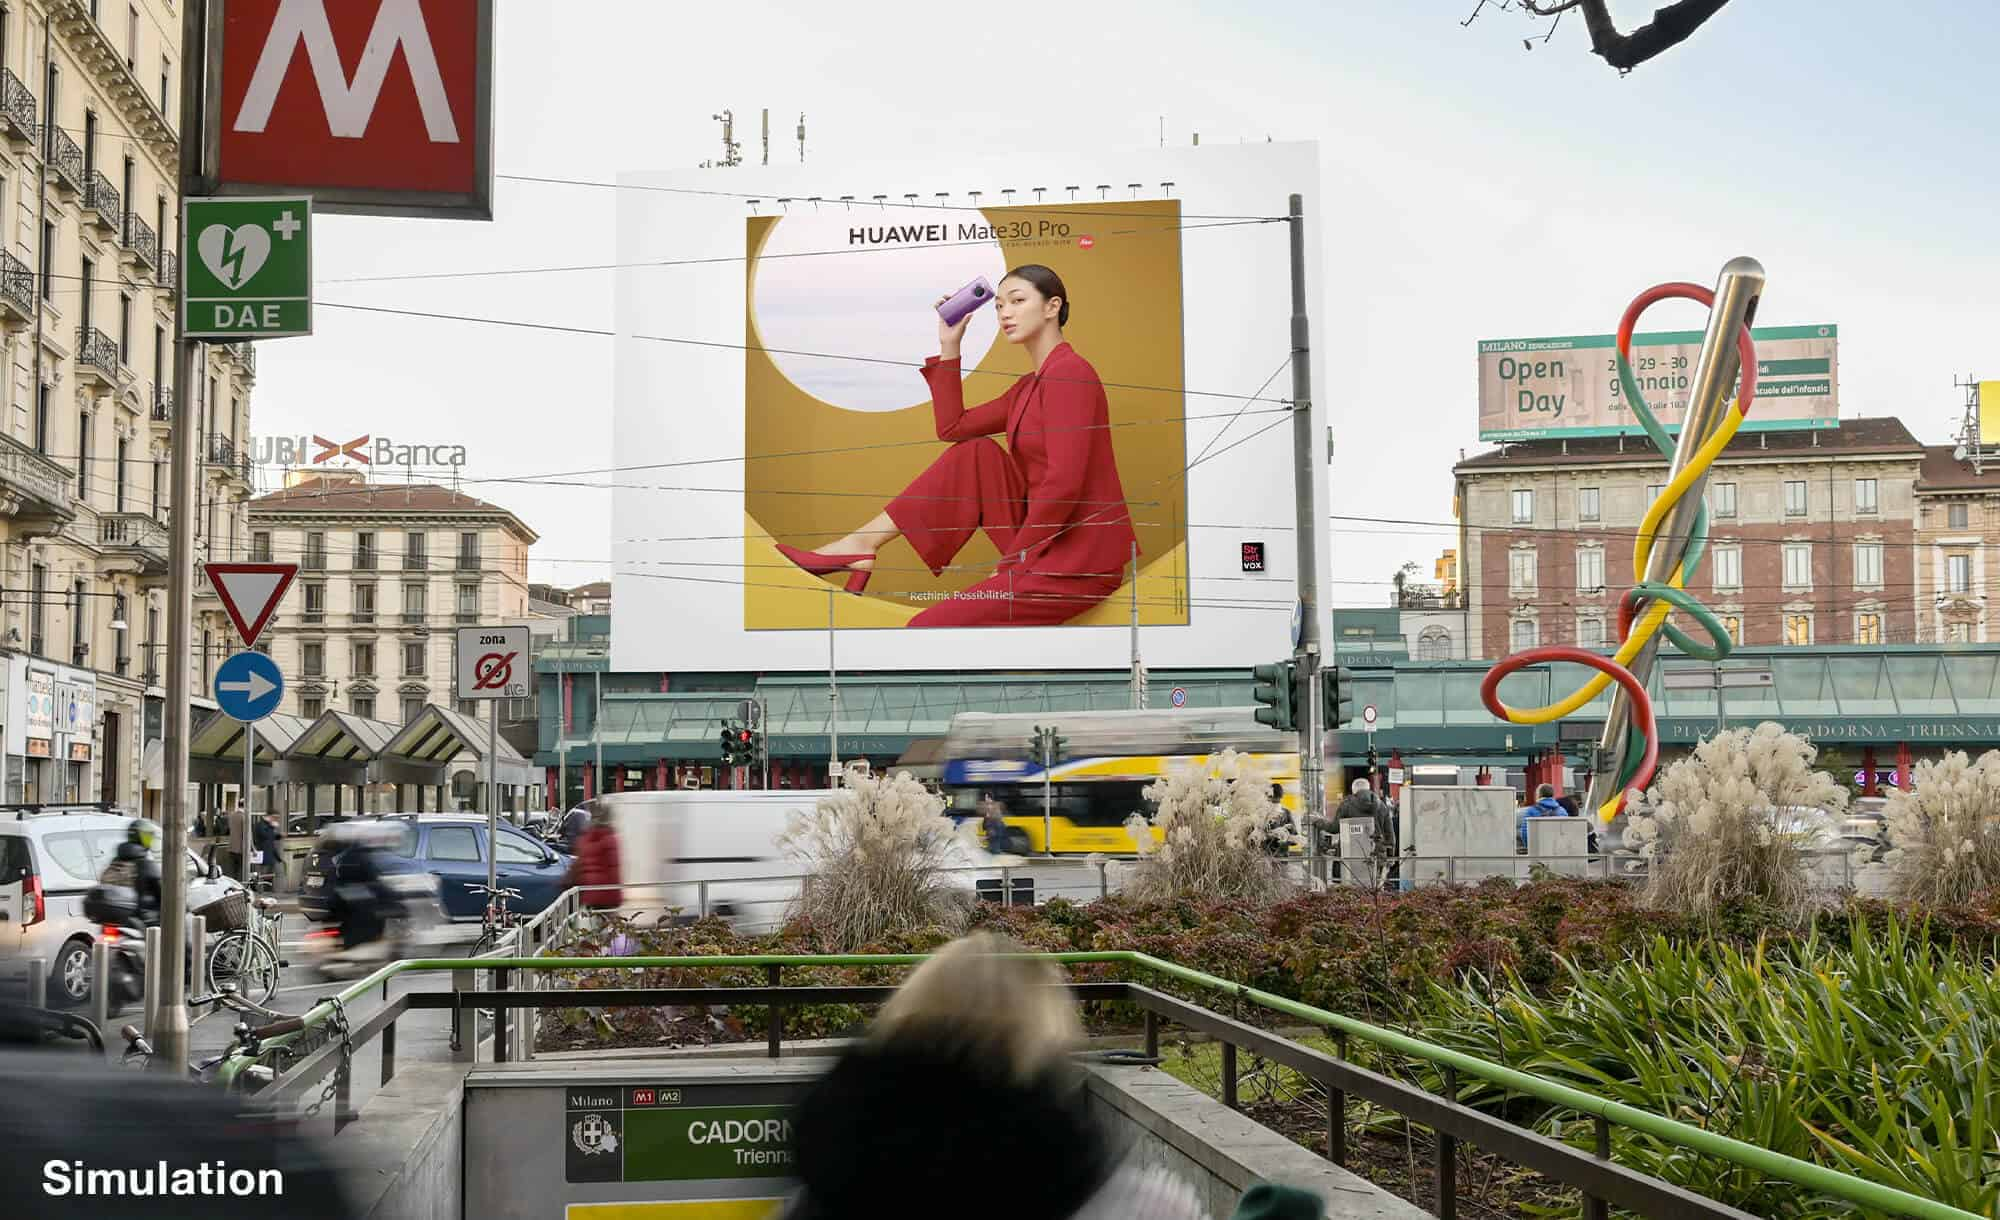 Maxi Affissione a Milano in Piazza Cadorna di Huawei (technology)